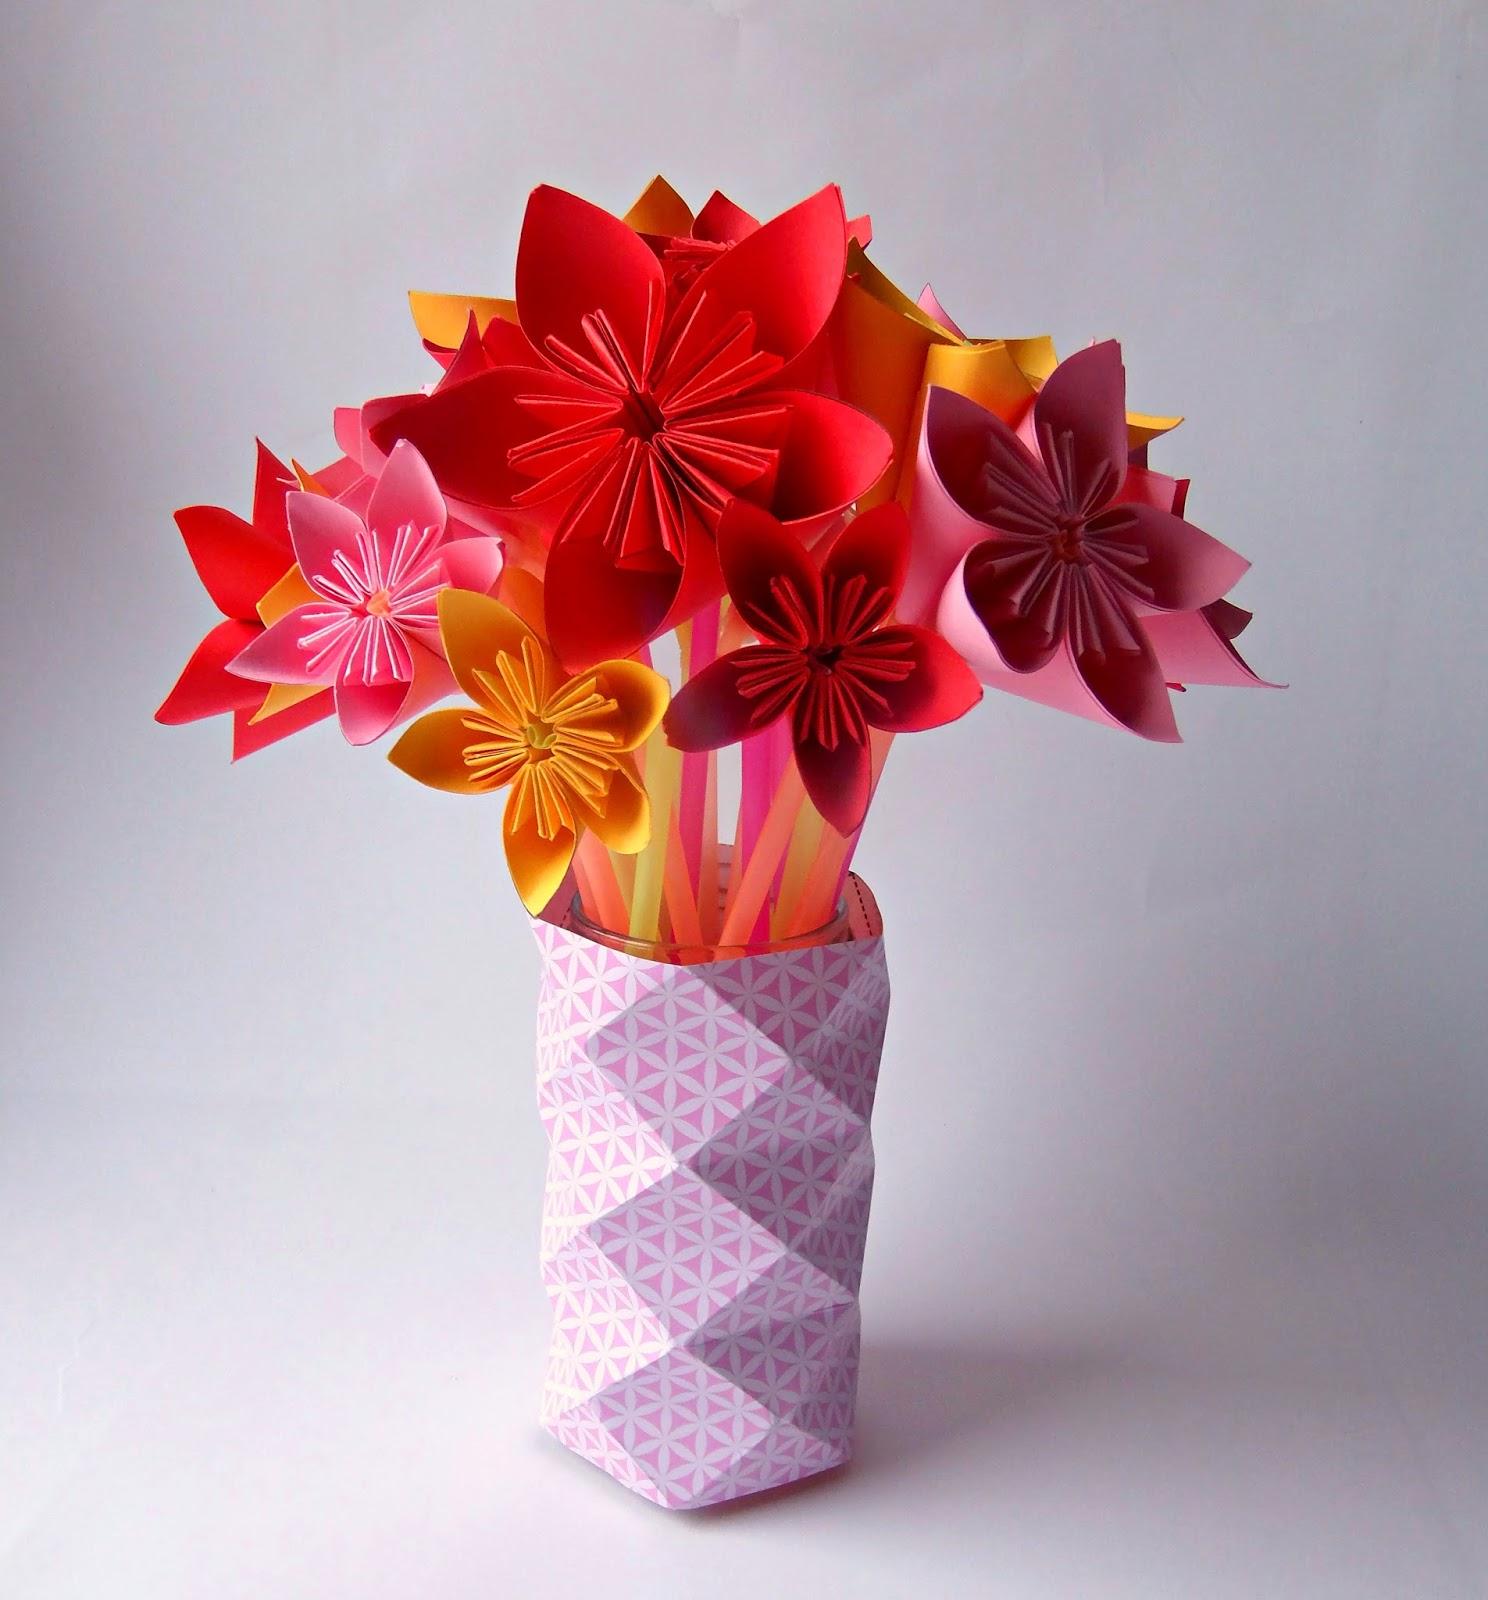 Connu Bouquet de fleurs origami - Truc & Tricks ON54